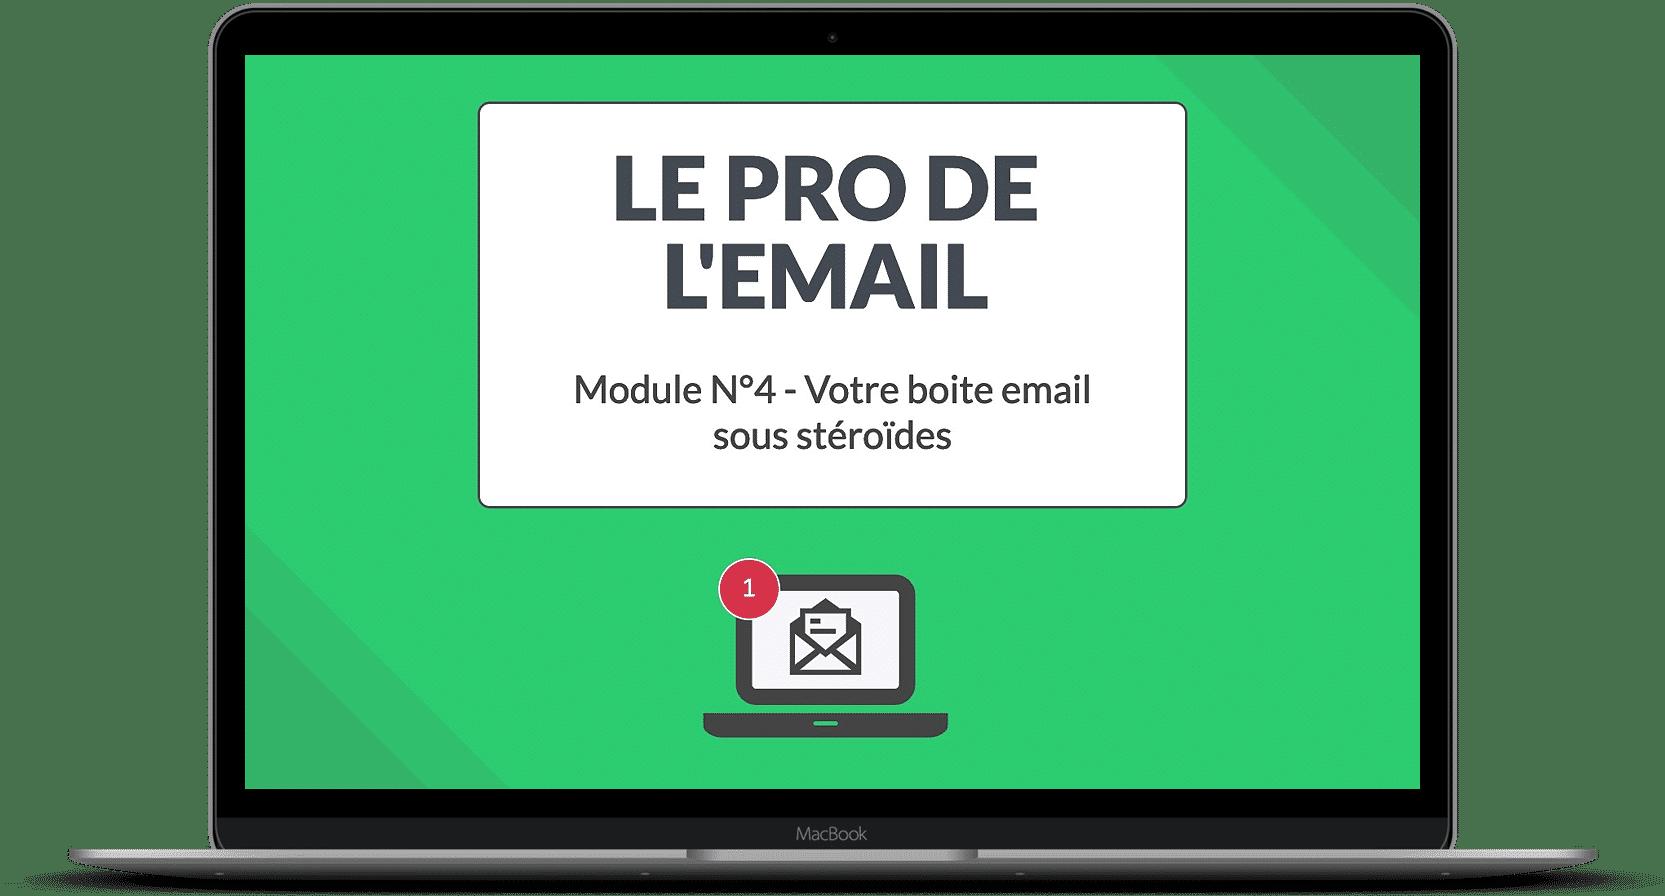 Module N°4 Email sous stéroïdes